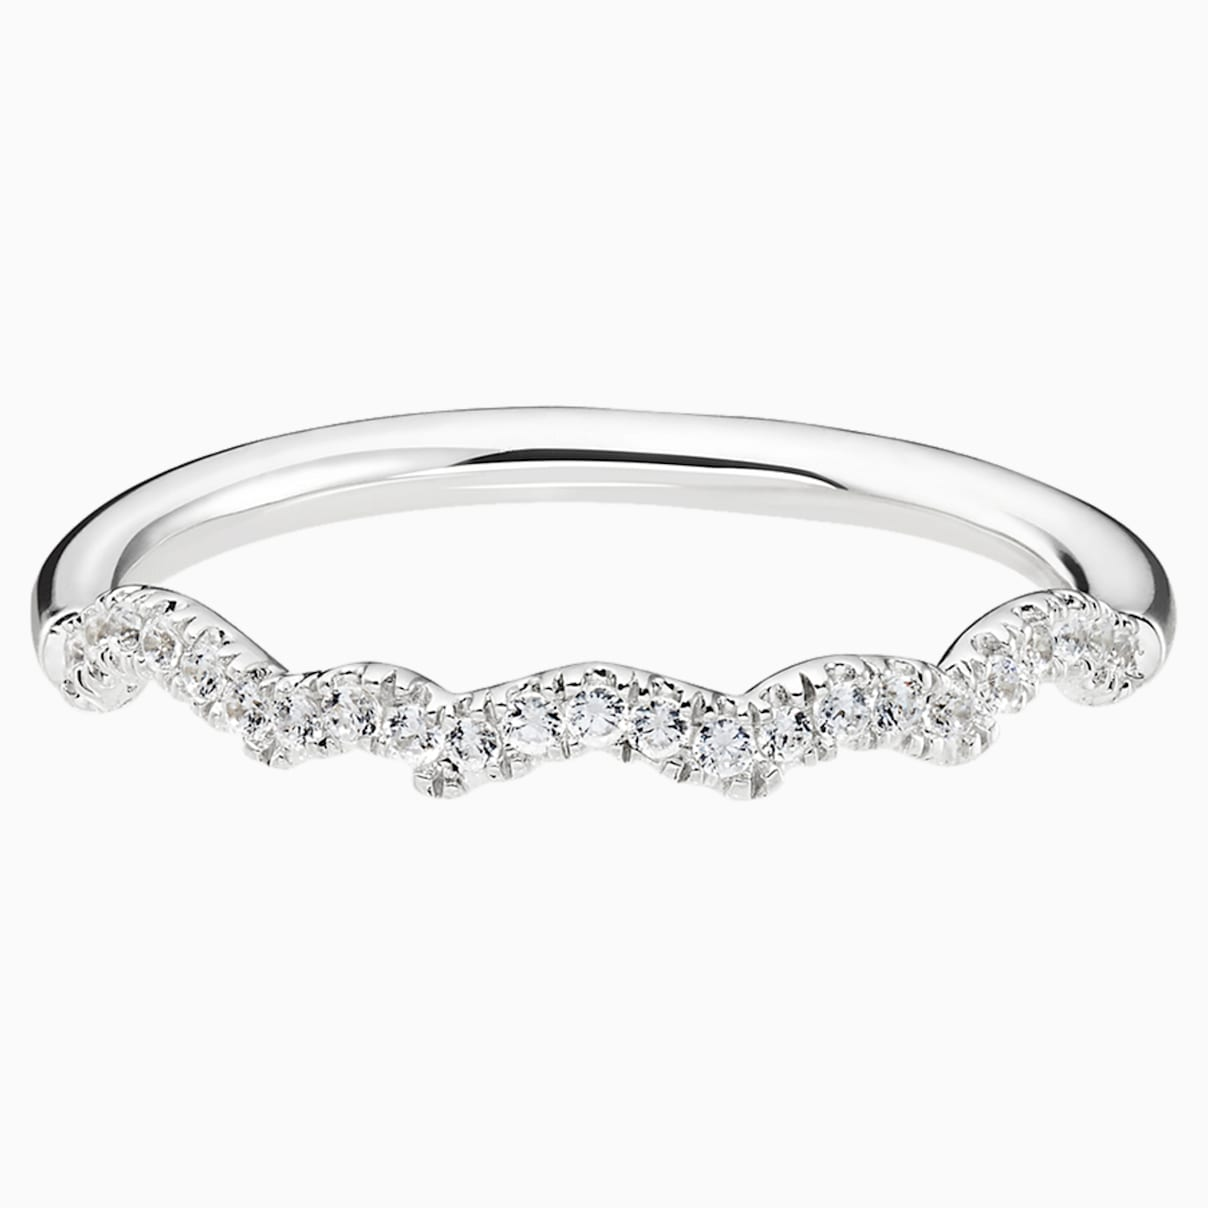 Knot of True Love Slim Band Ring, Swarovski Created Diamonds, 18K White Gold, Size 52